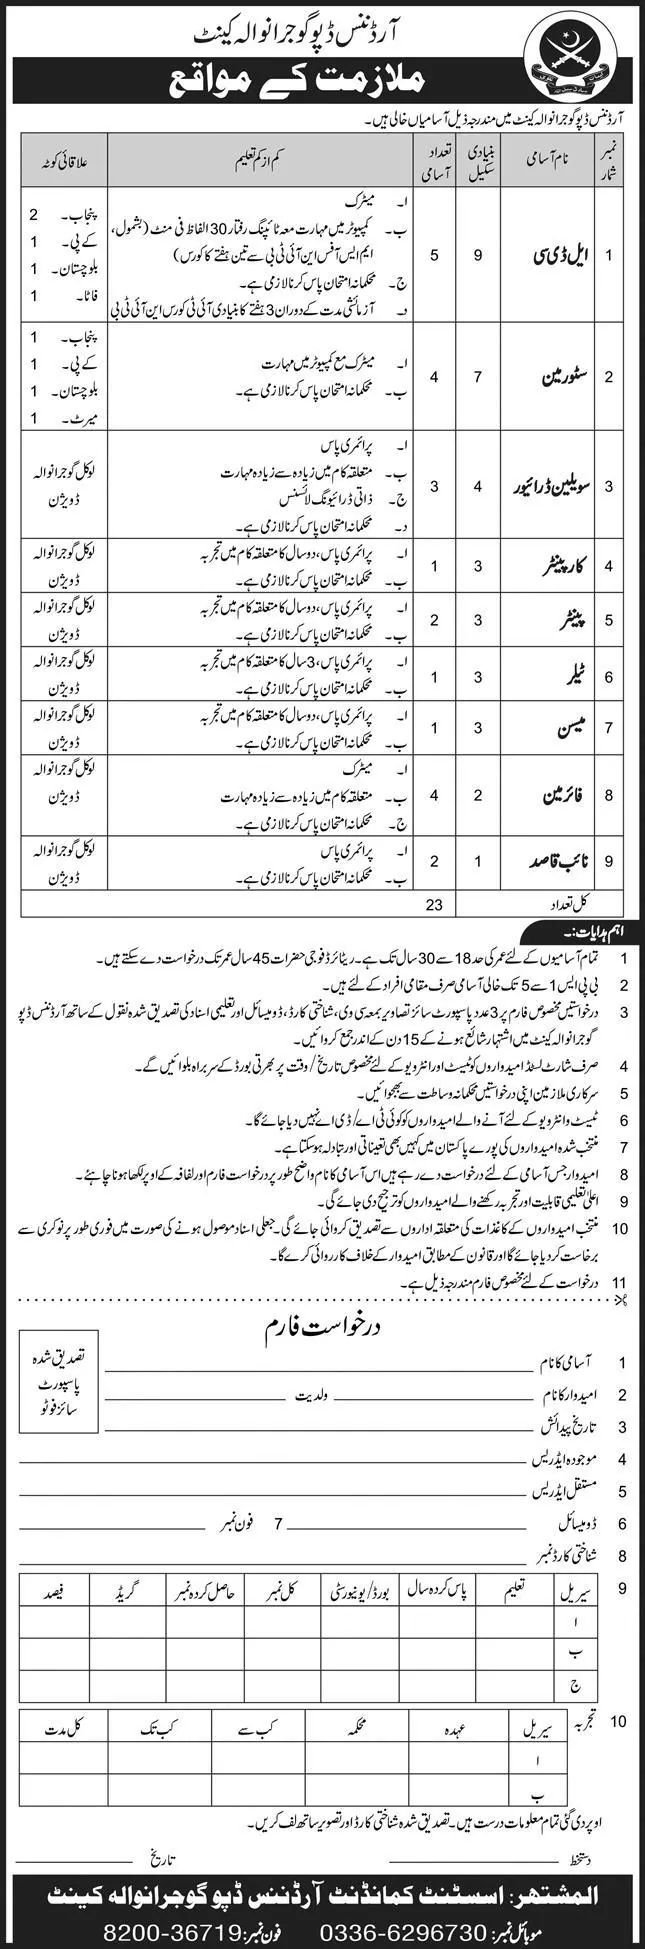 latest Pak Army Jobs 2020